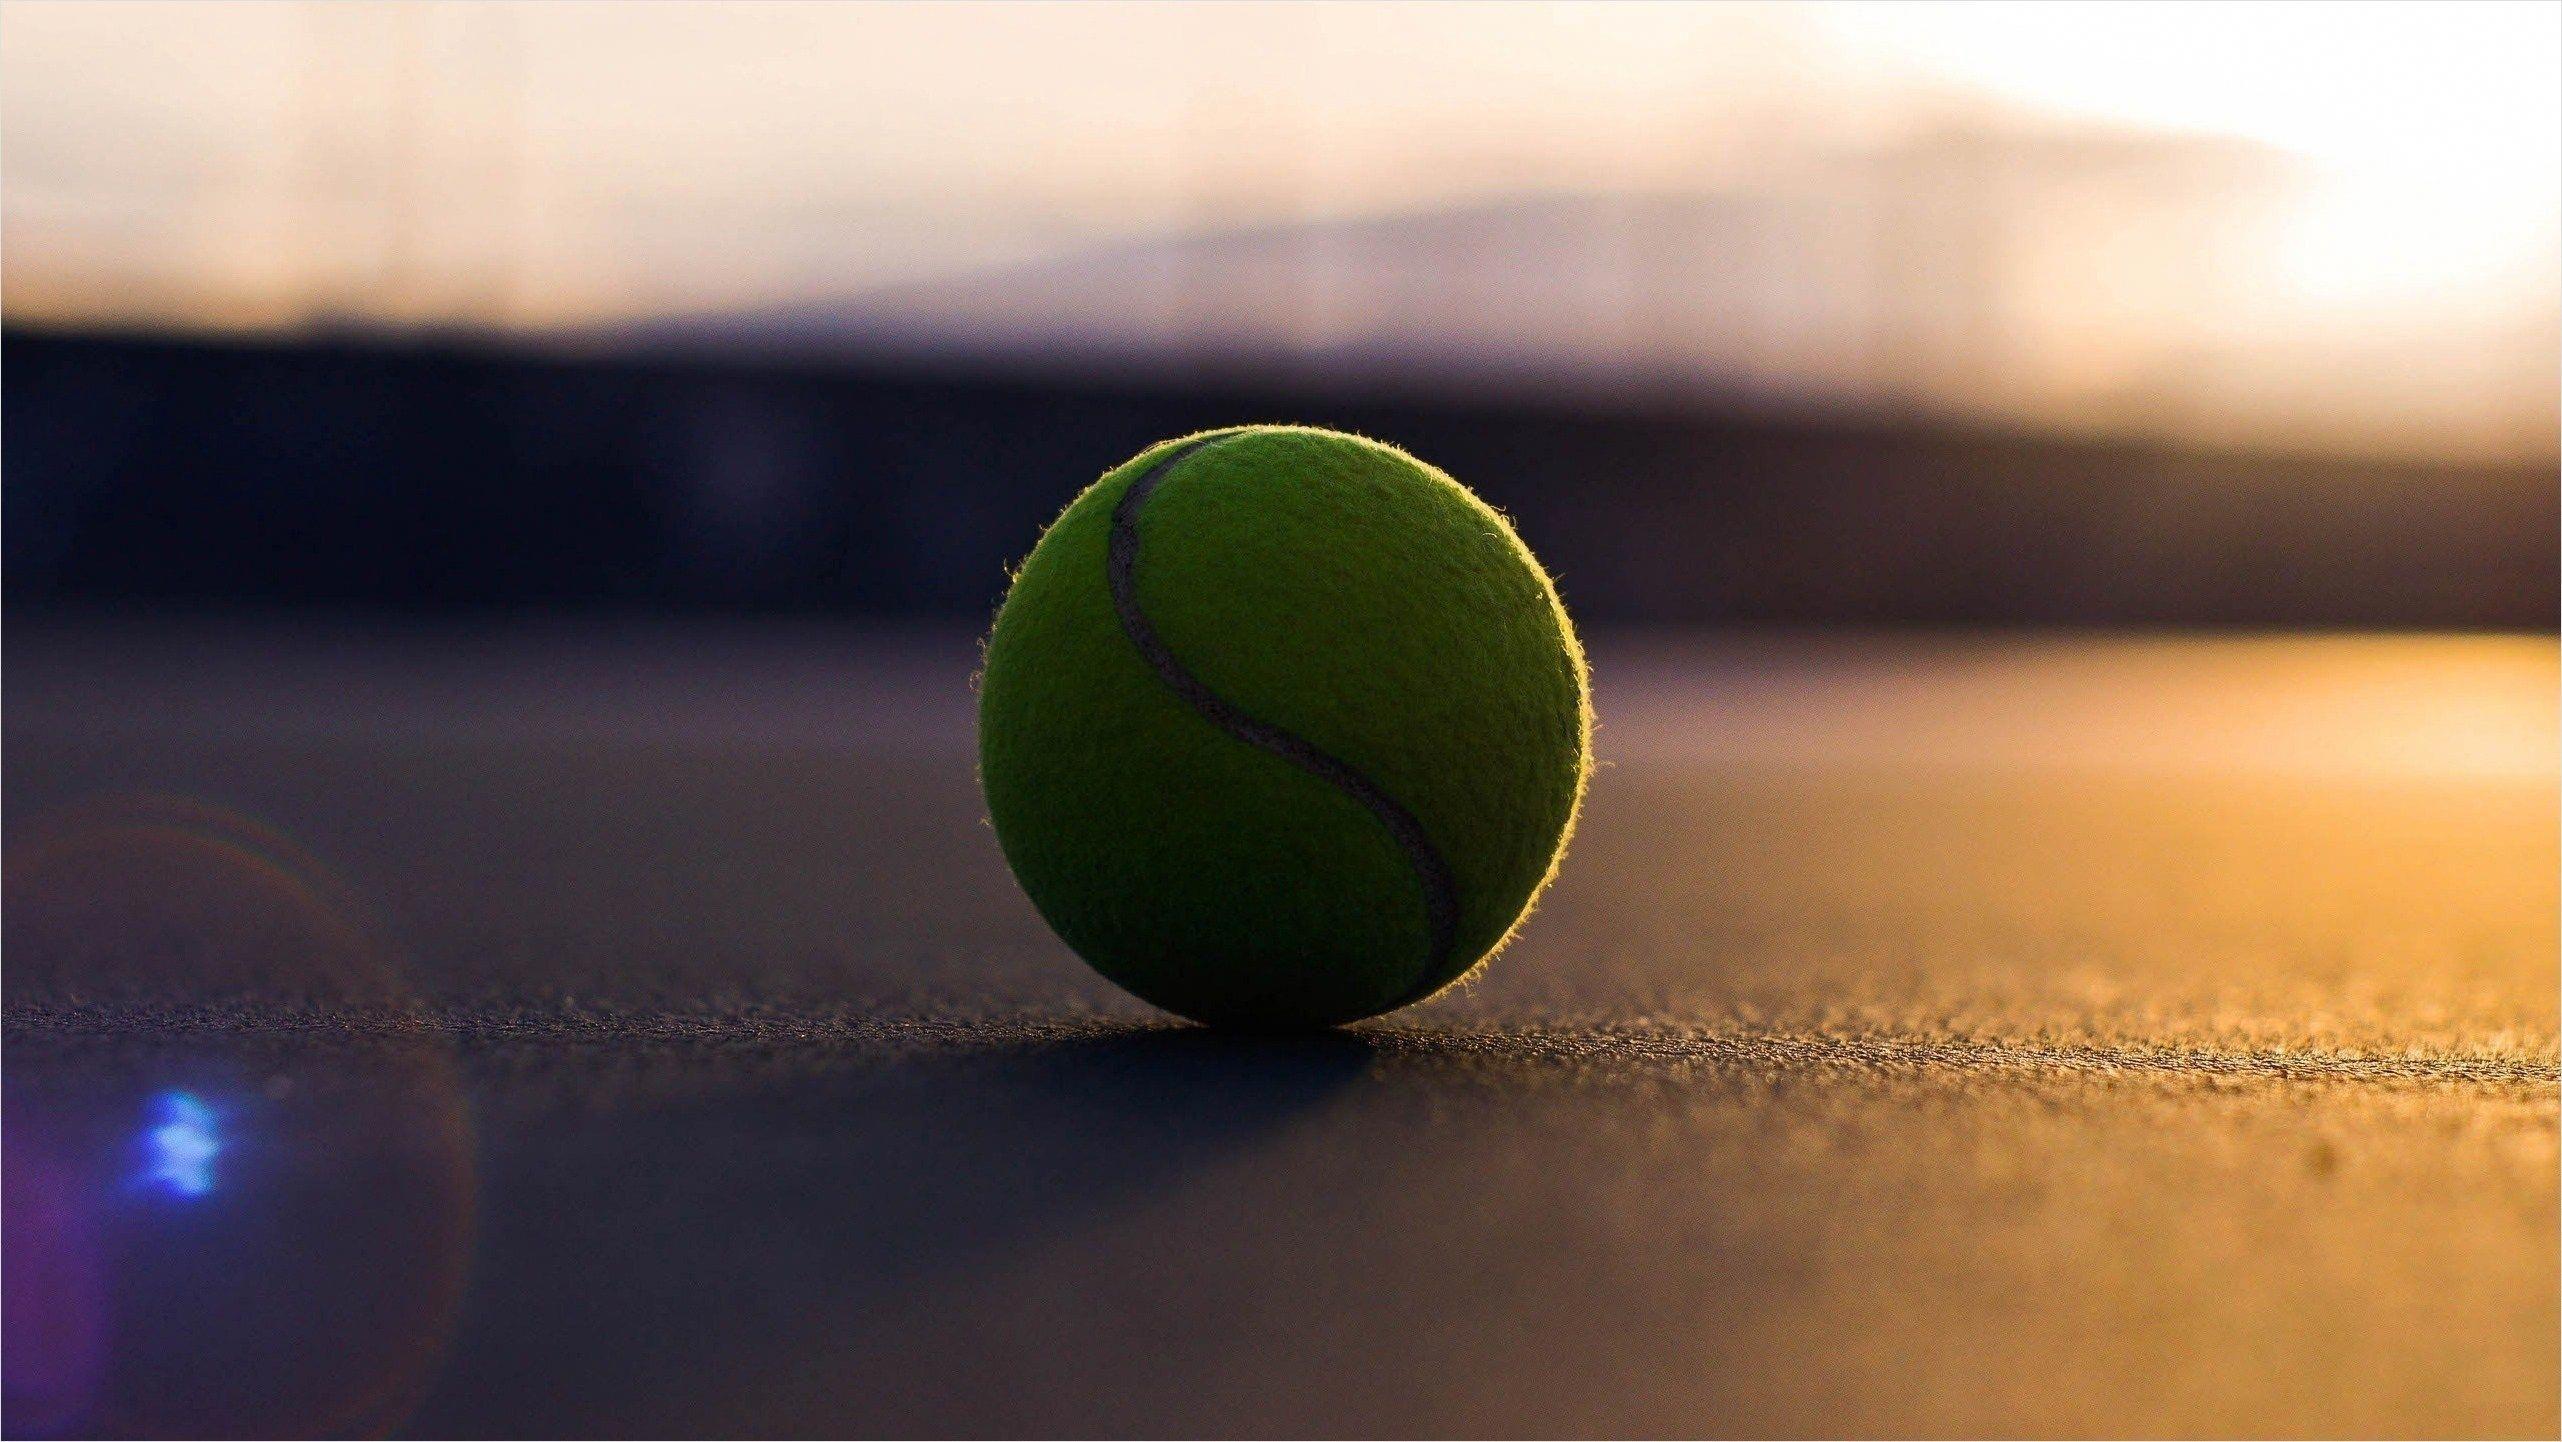 Perfect Tennis Ball Asphalt Shadow Hd Wallpaper Tennis Wallpaper Tennis Ball Tennis